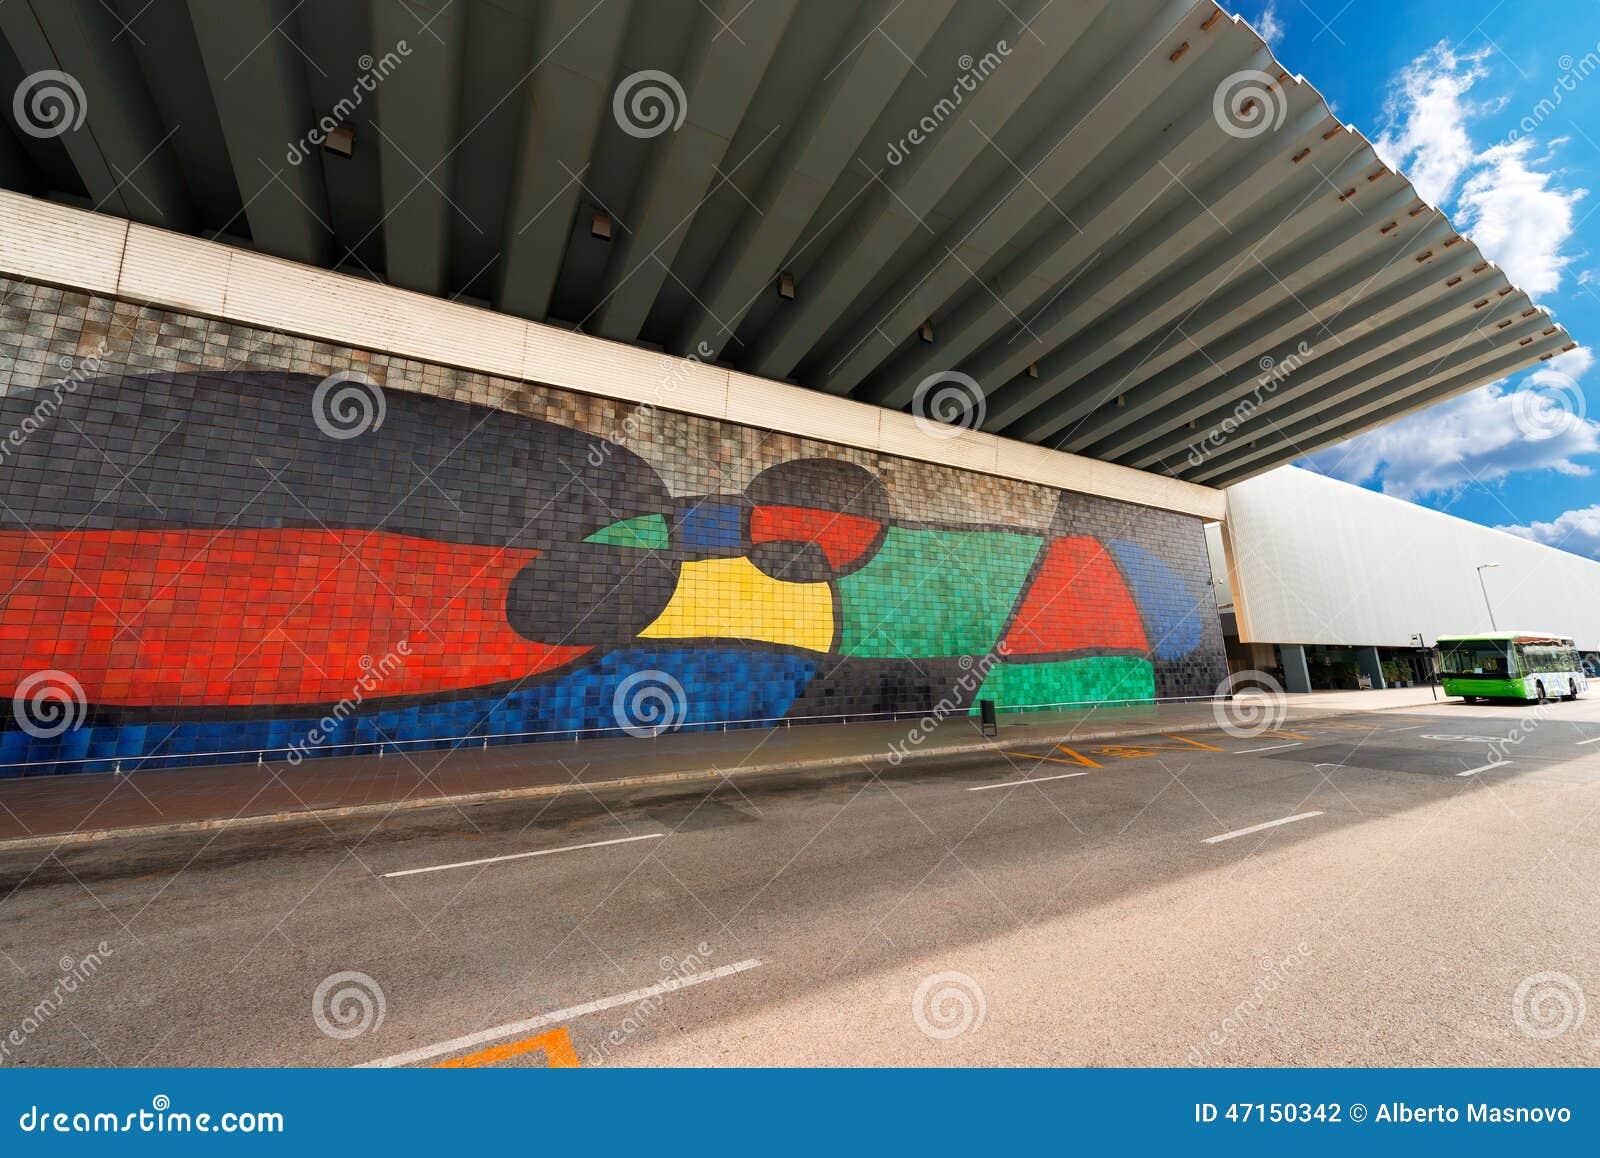 Joan Miro - grande peinture murale en céramique - Barcelone